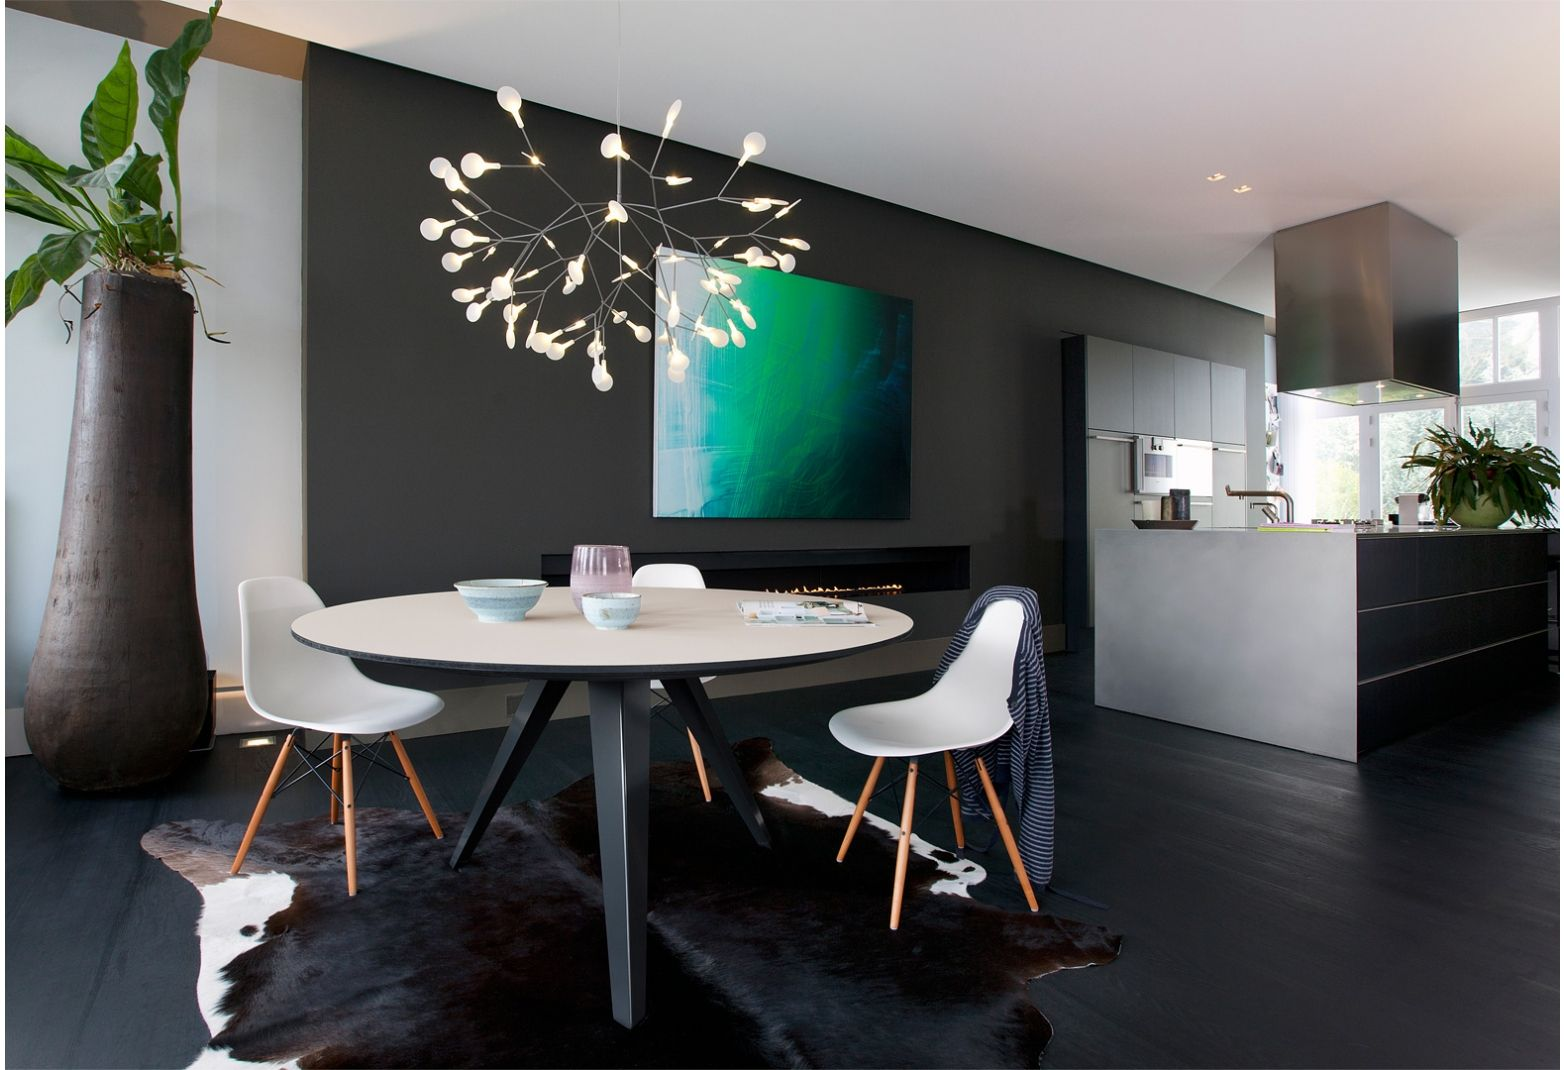 Belly ronde tafel odesi dutch design online huis woonkamer